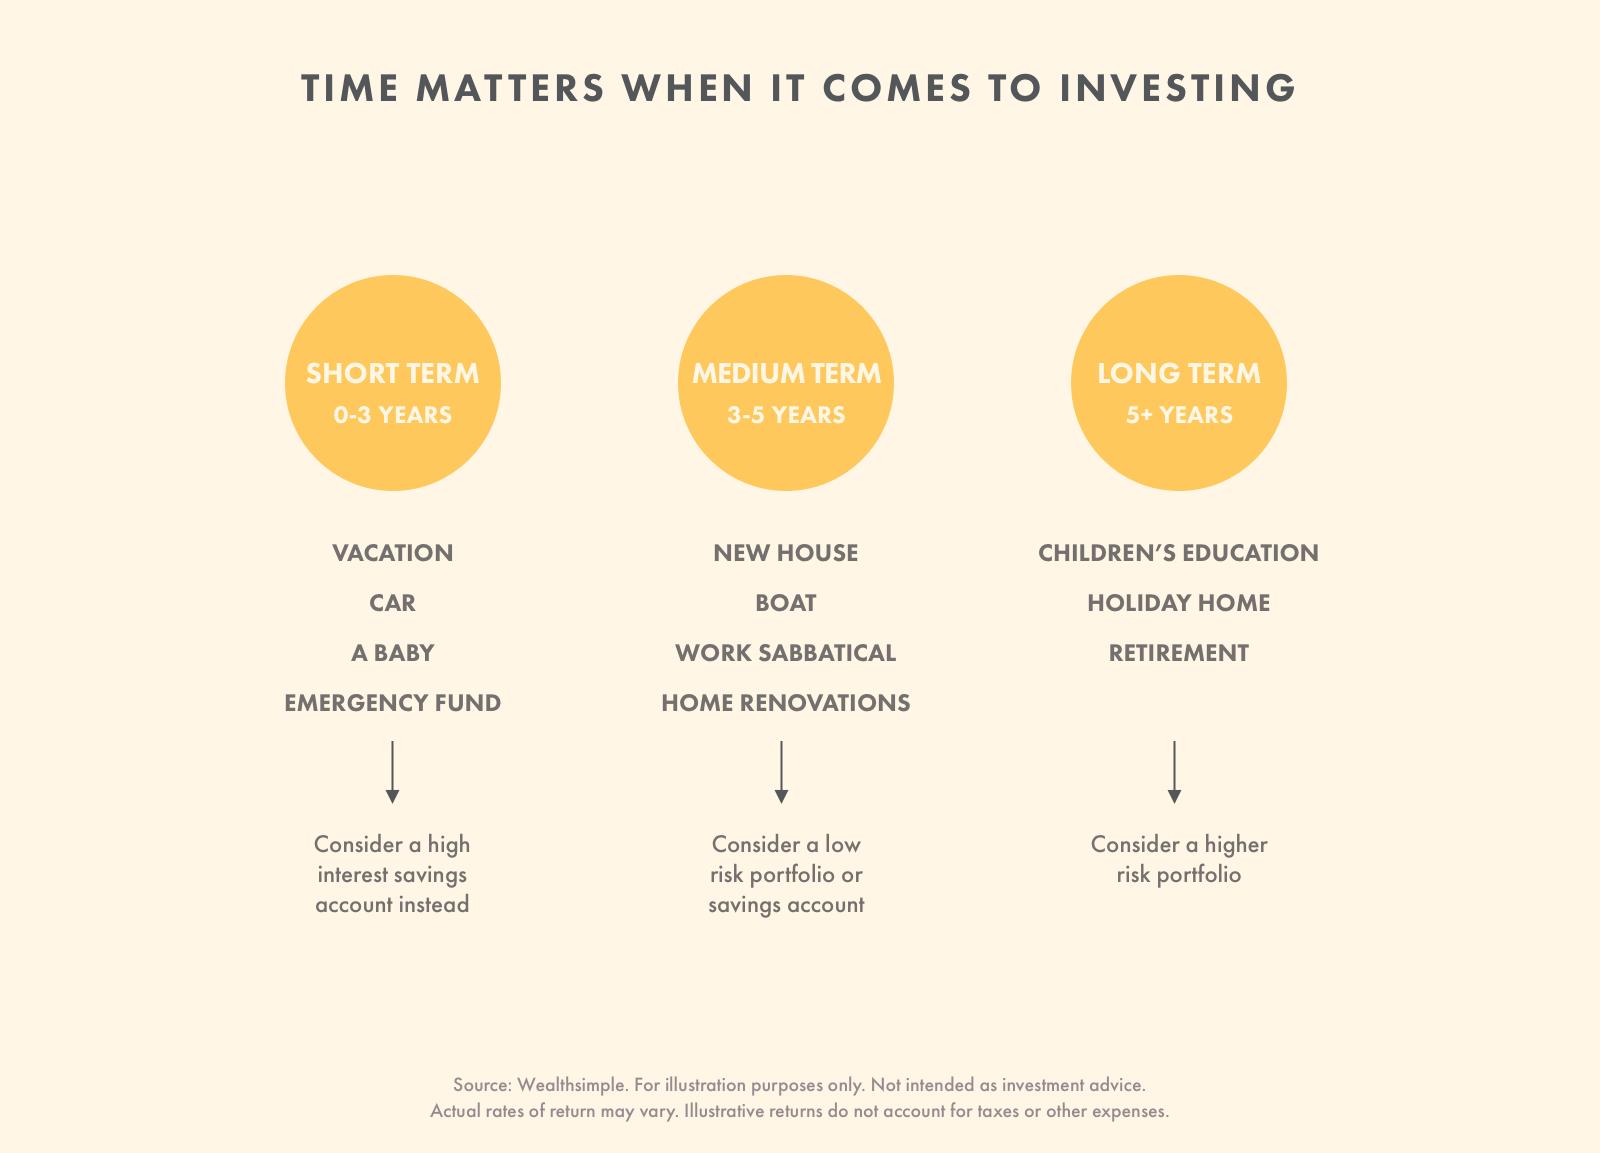 How To Buy Stocks Beginners Guide Wealthsimple